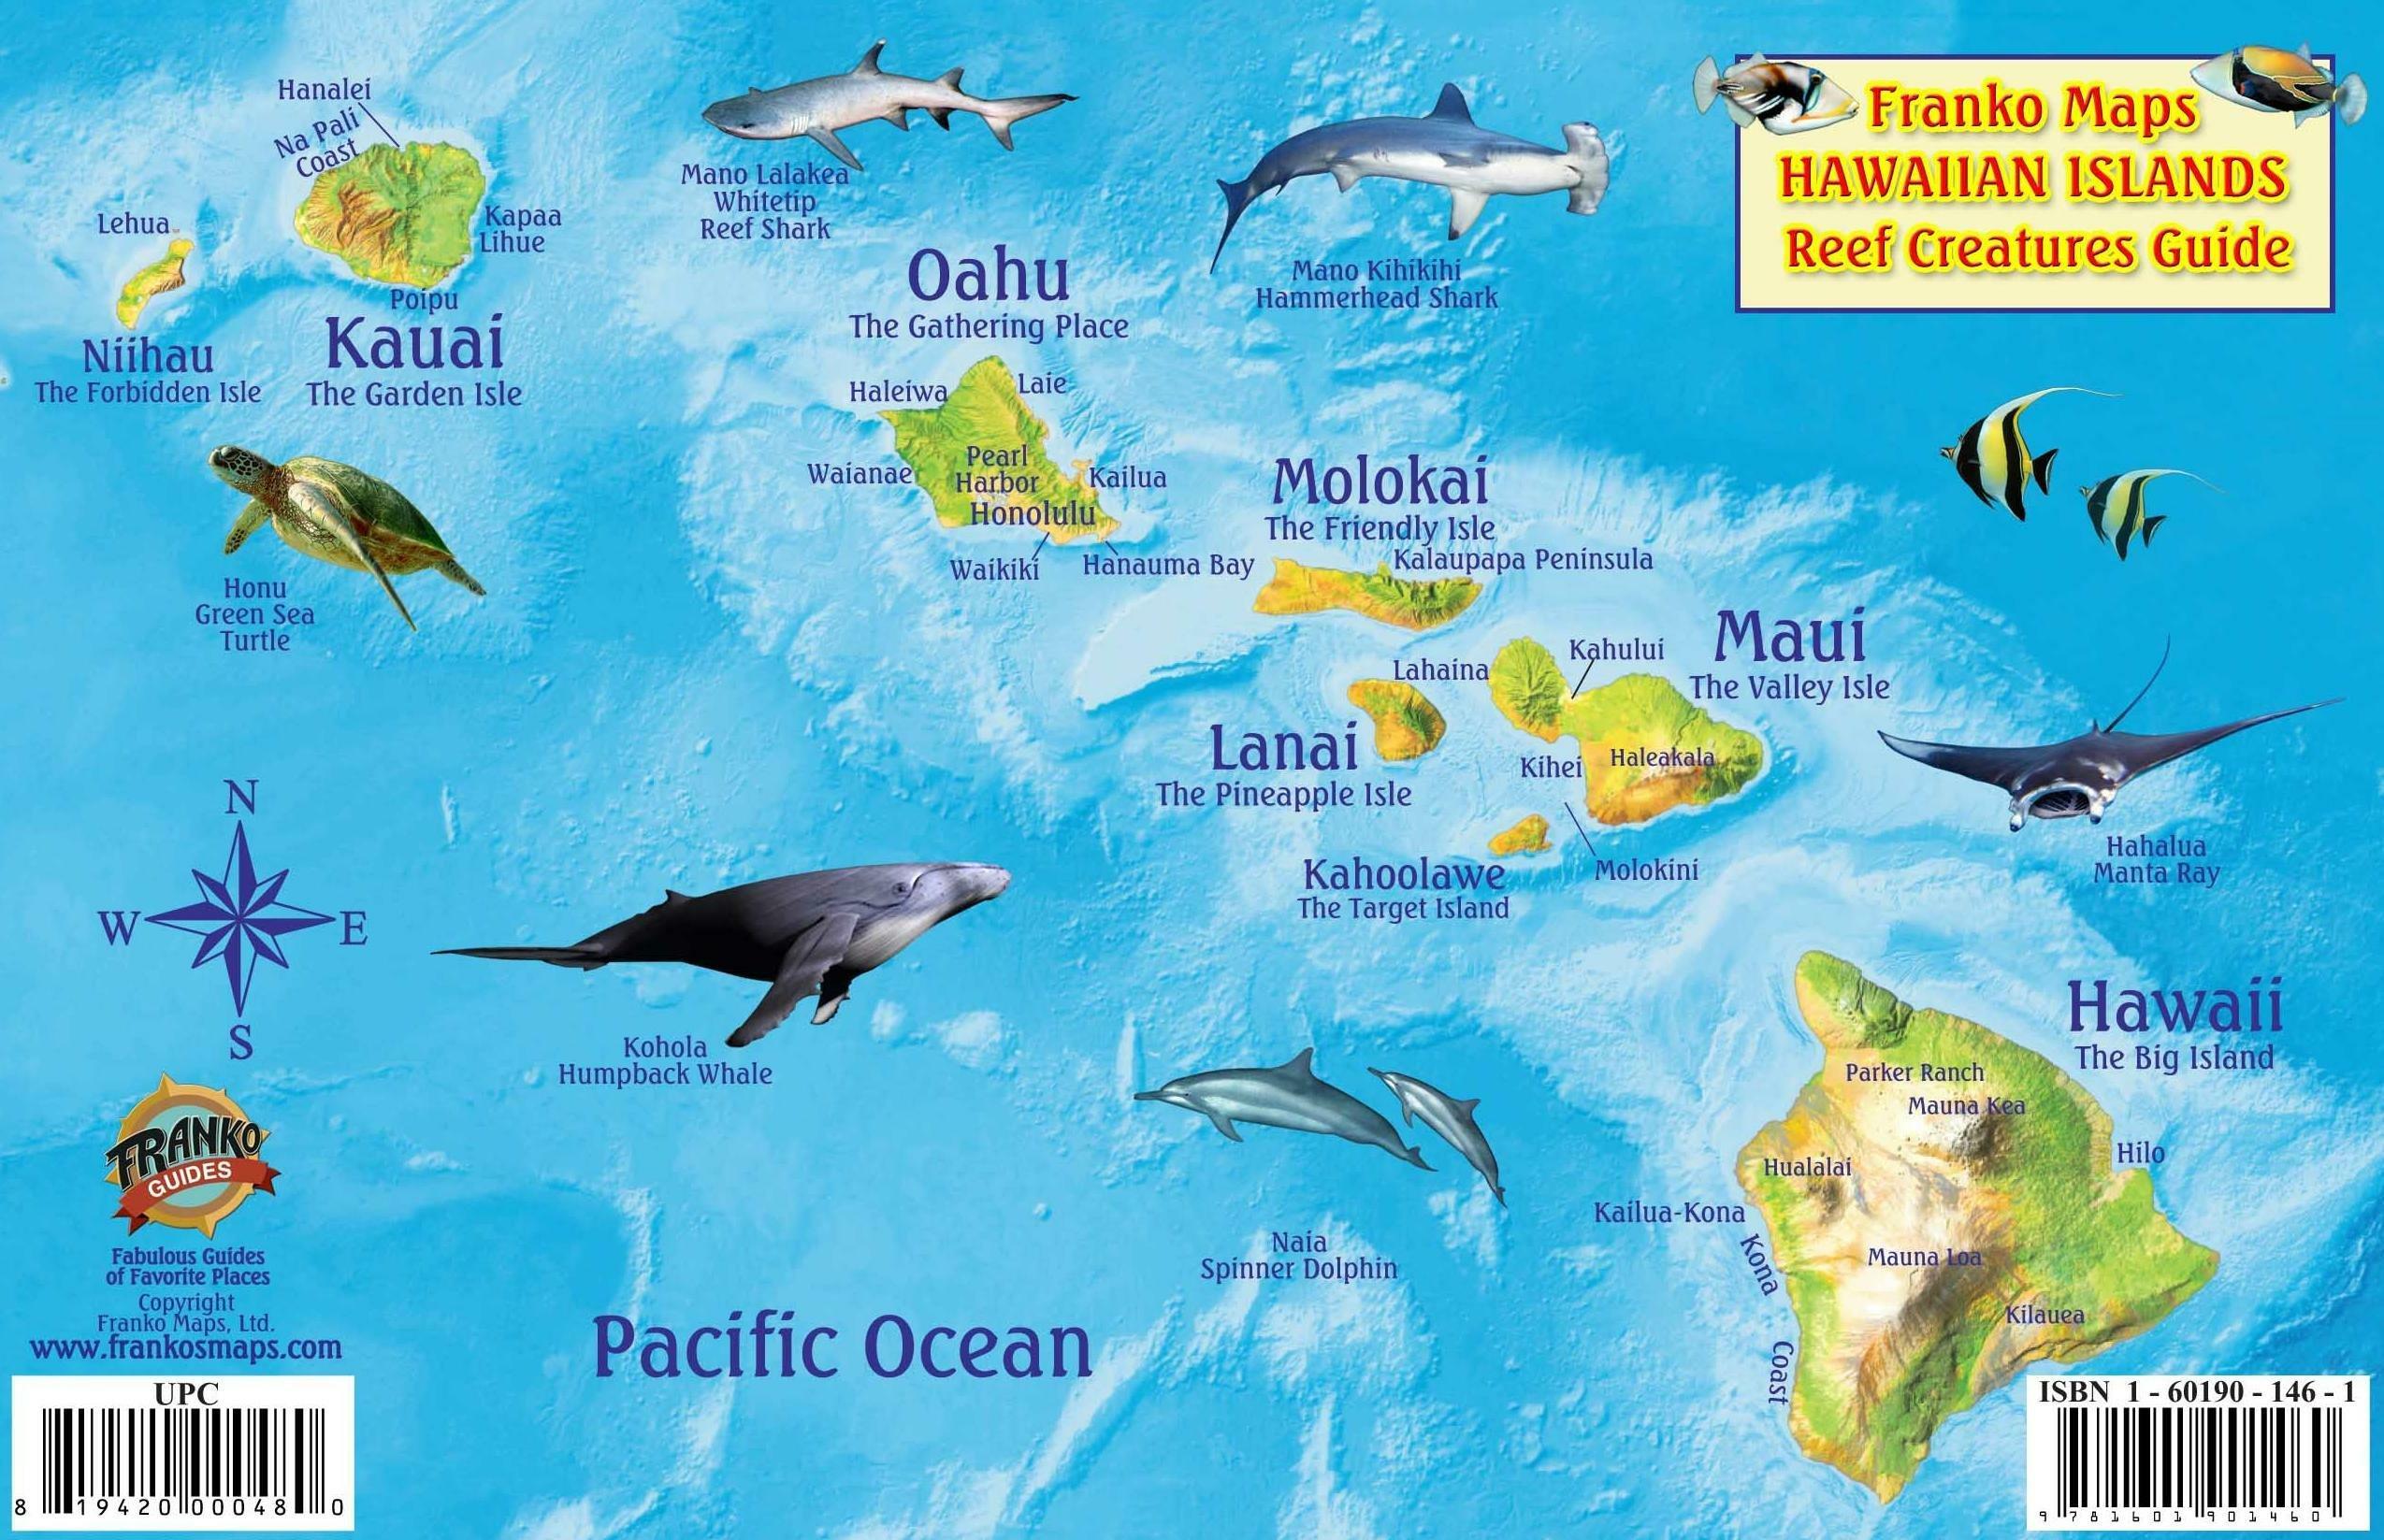 Hawaiian Islands Map & Coral Reef Creatures Guide Franko ... on mauna loa, french polynesia map, oahu map, diamond head, james cook, hawaiian language, honolulu map, caribbean islands map, waikīkī, kauai map, hawaiian island chain, new zealand map, aleutian islands map, tropical island map, necker island, hawaiian island colors, midway atoll, tasmania map, hawaii map, maui map, pacific islands map, big island map, bahamas map, austria map, ford island map, mauna kea, new caledonia map, japan map,